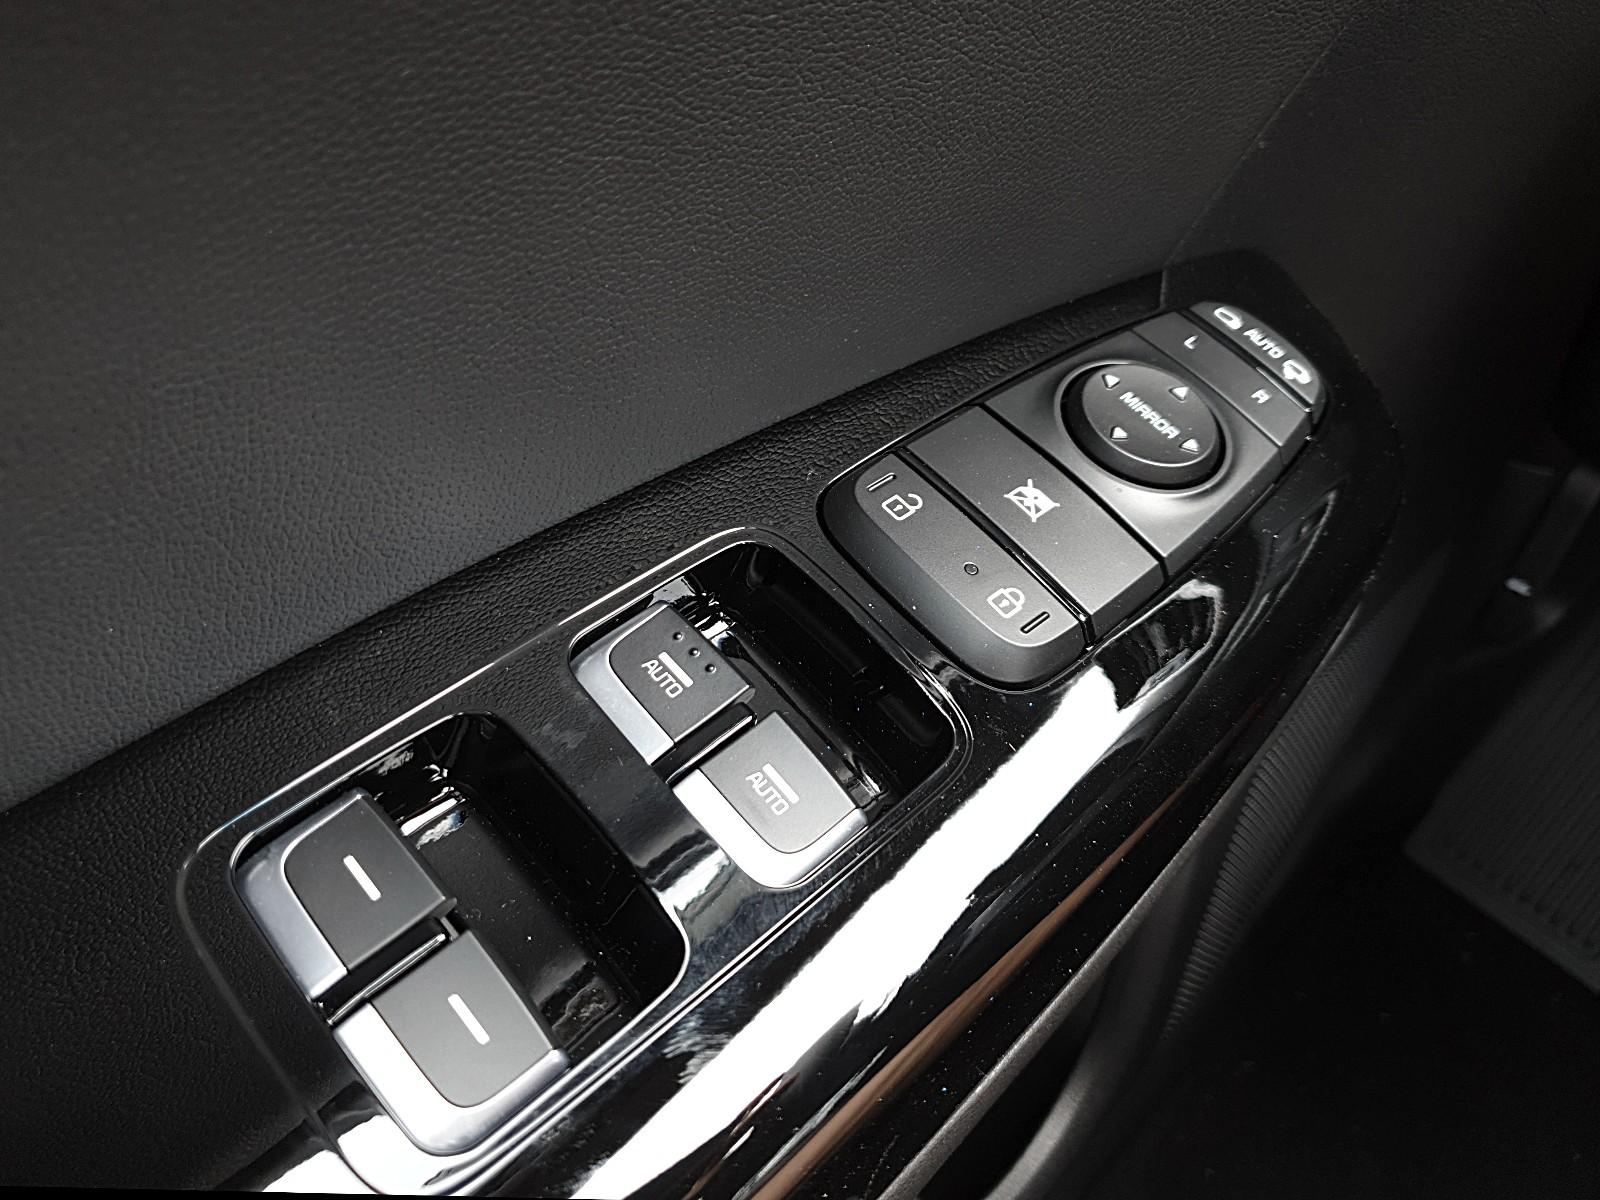 KIA SPORTAGE 1.6 T-GDI 177PS 4WD Automatik GT-Line LED-Scheinw. elekt. Panora Viscaal Fahrzeuggrosshandel GmbH, D-49847 Itterbeck